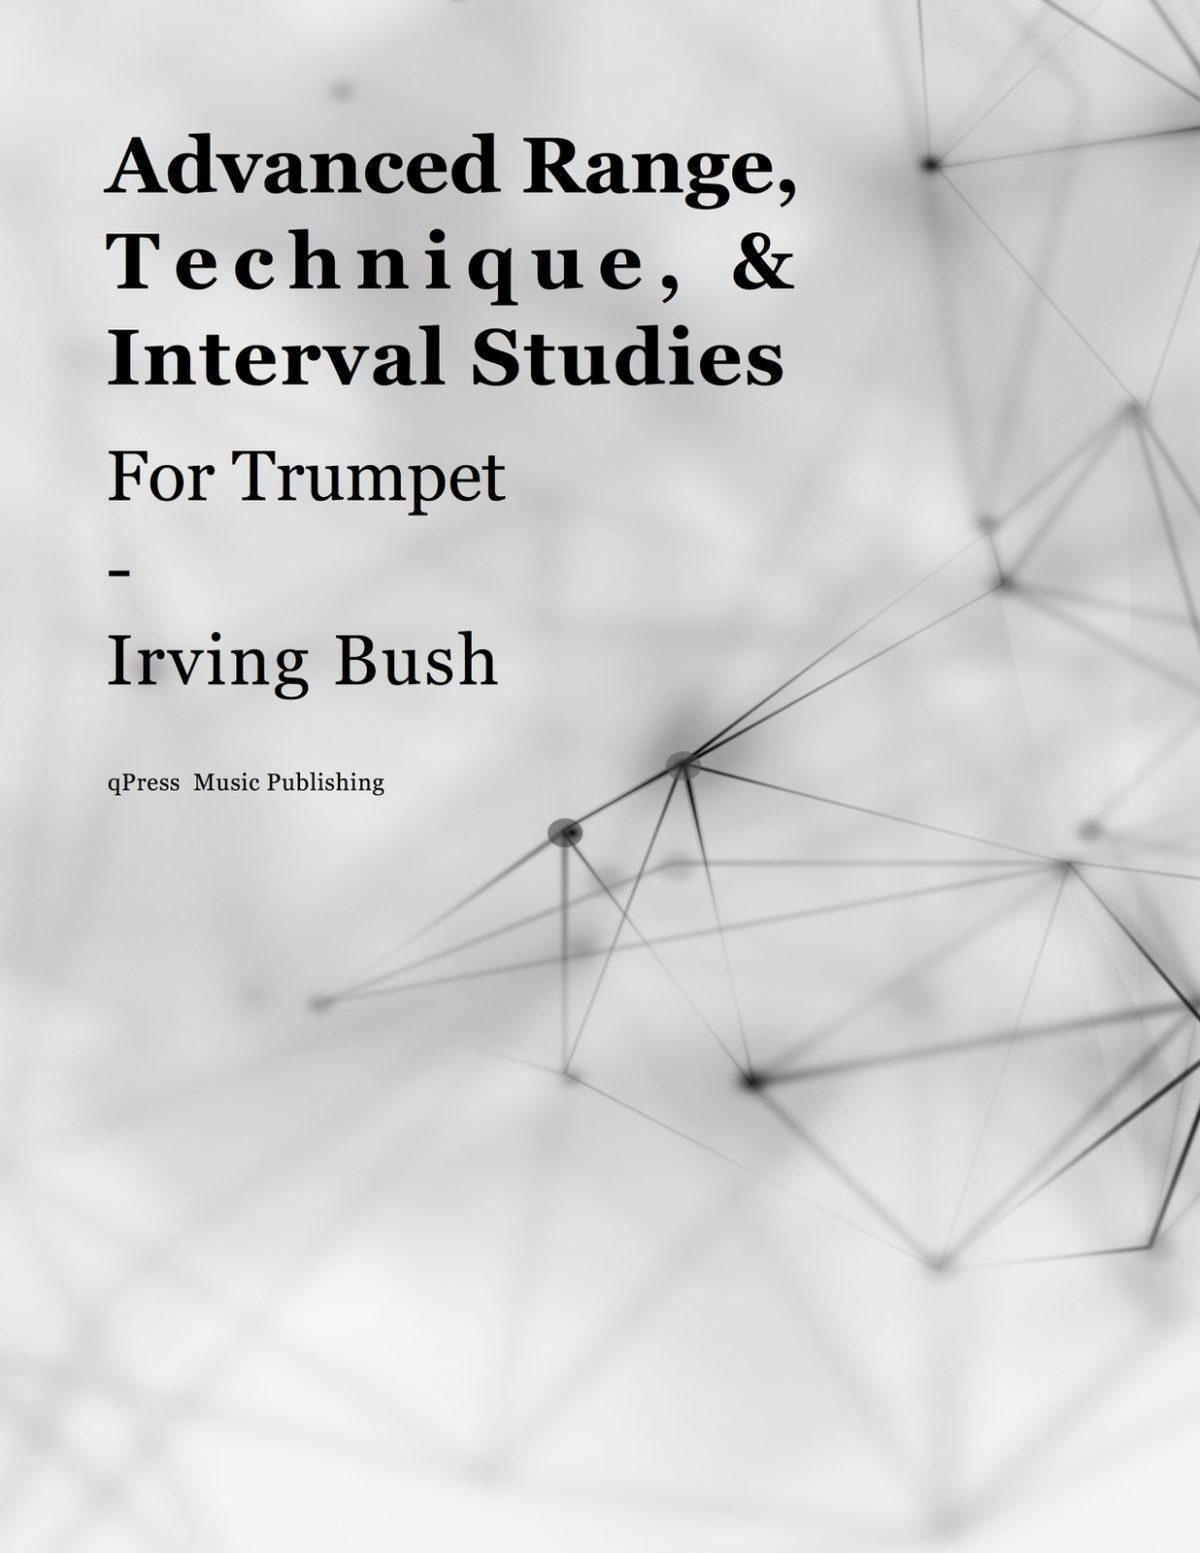 Bush, Irving Advanced Range, Technique & Interval Studies for Trumpet-p01